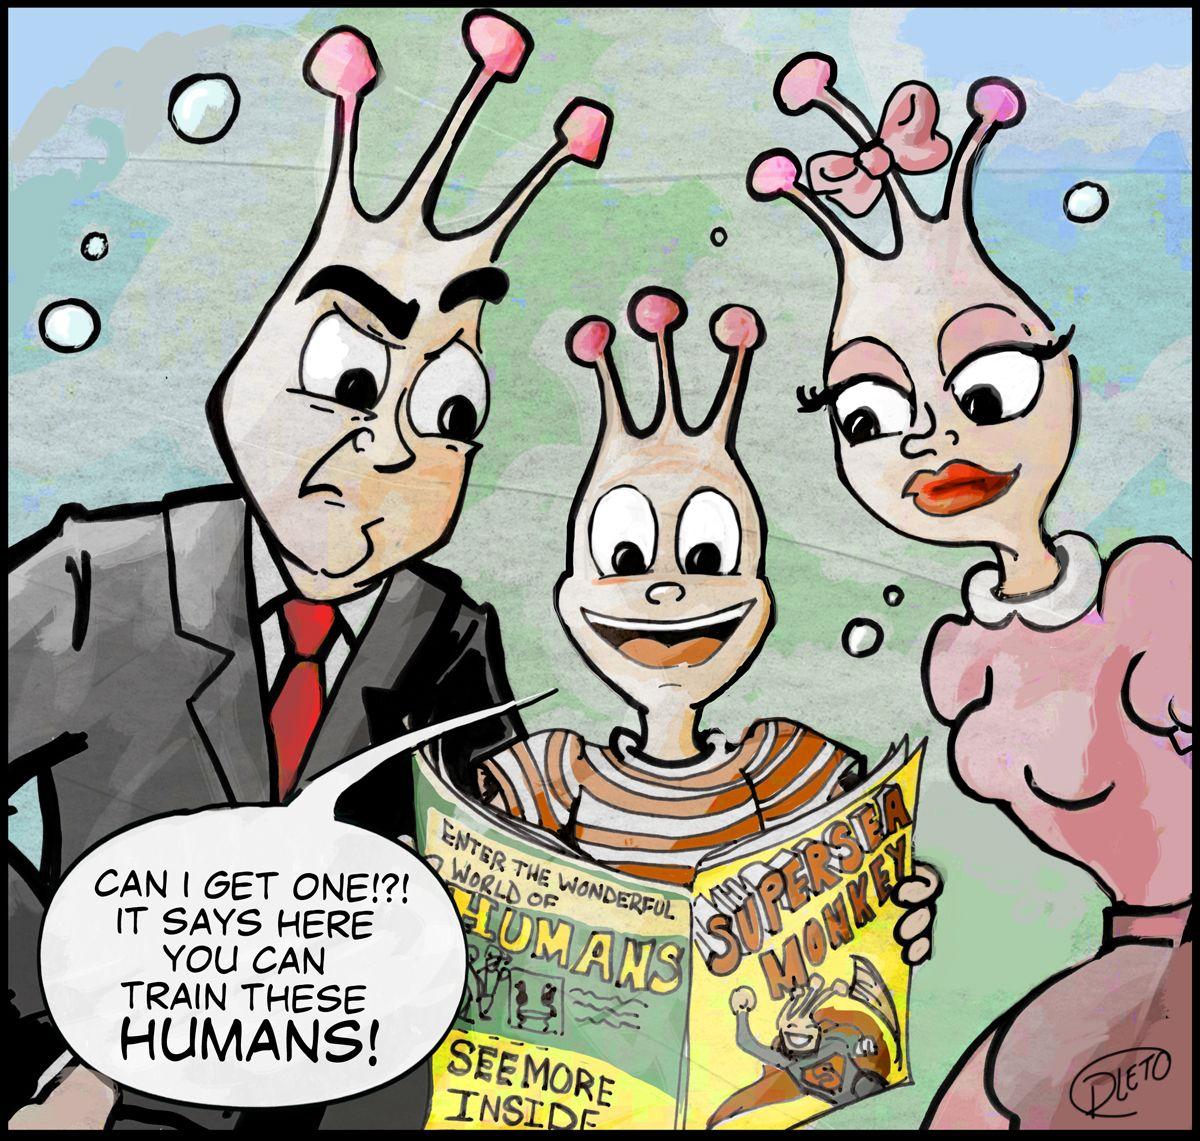 Diana Leto Lil Sea Monkey Switch A Roo Cartoon For You Sea Monkeys Monkeys Funny Fairytale Illustration